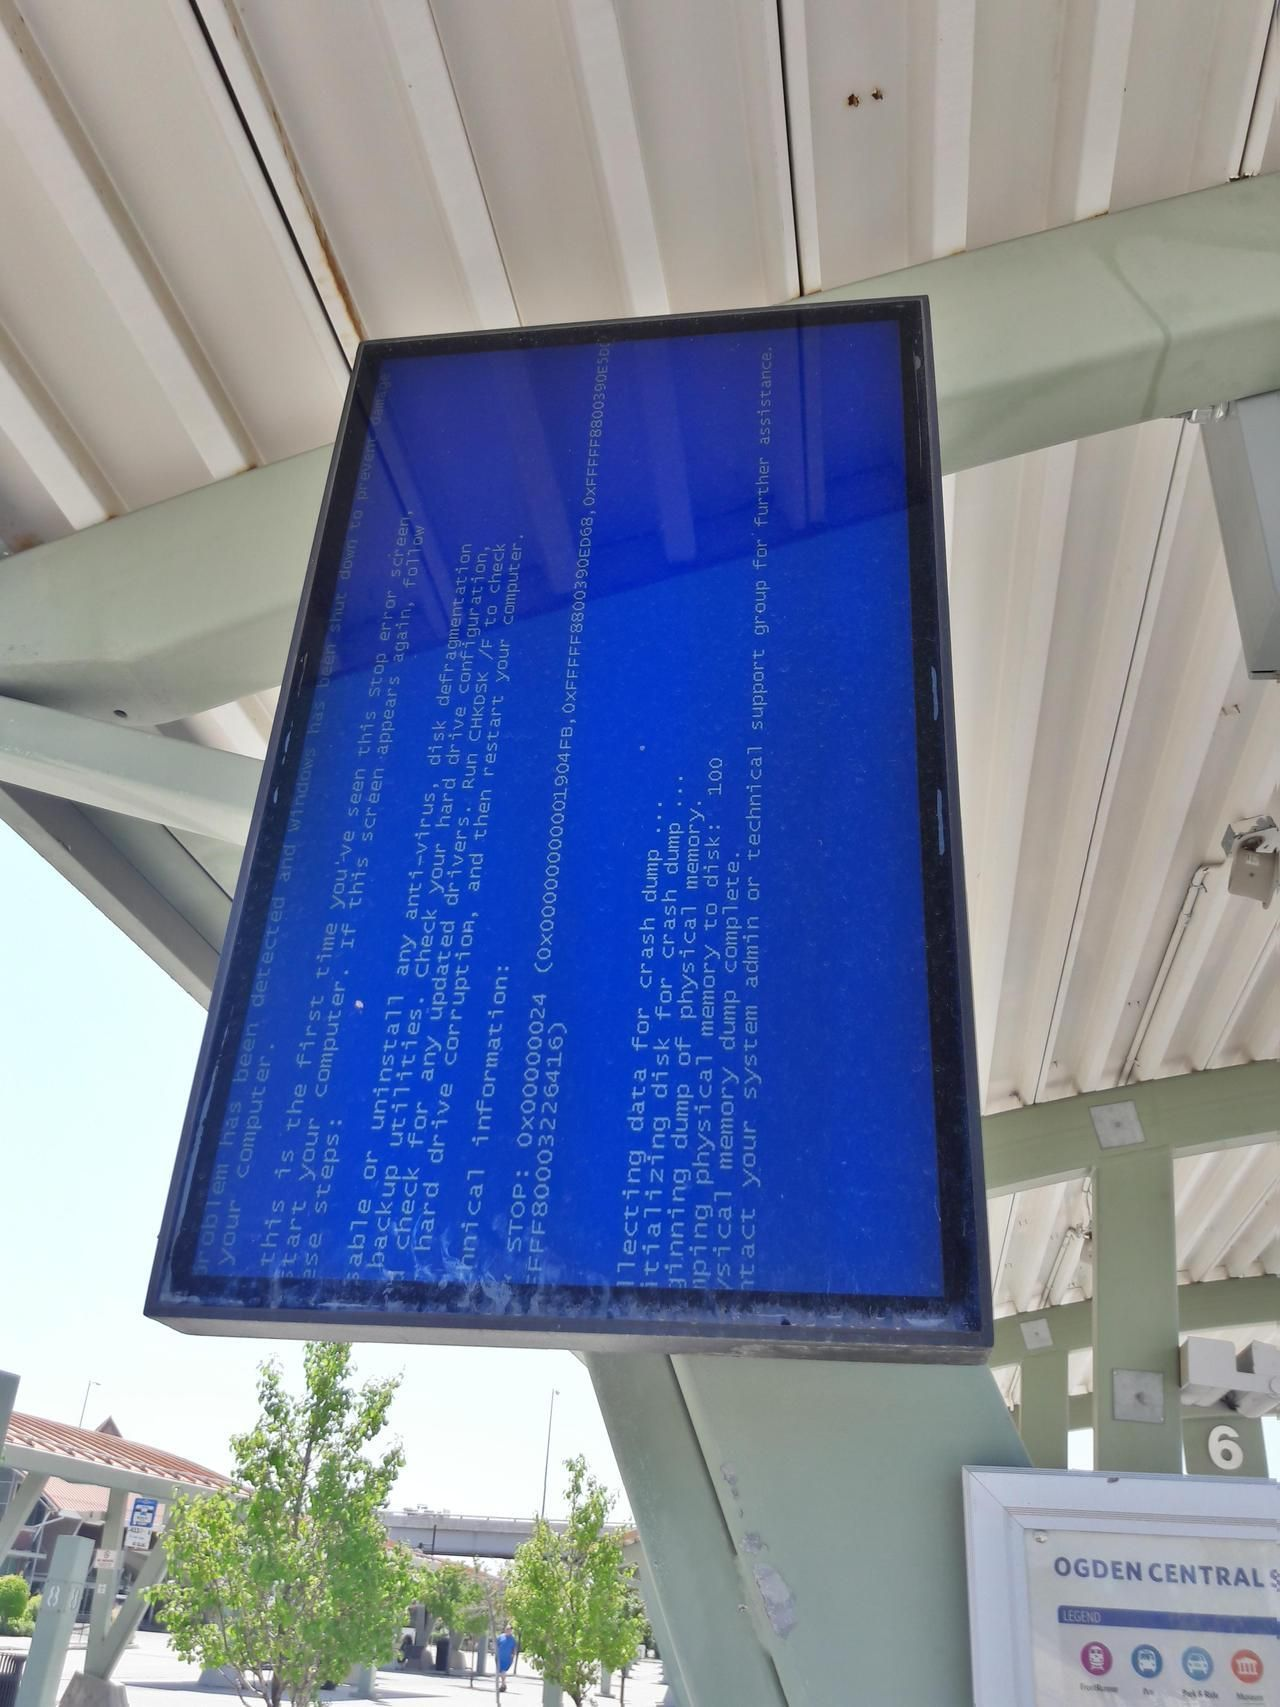 The Bus To Technoland Has Broken Down Bsod Pbsod Blue Screen Break Down Bsod